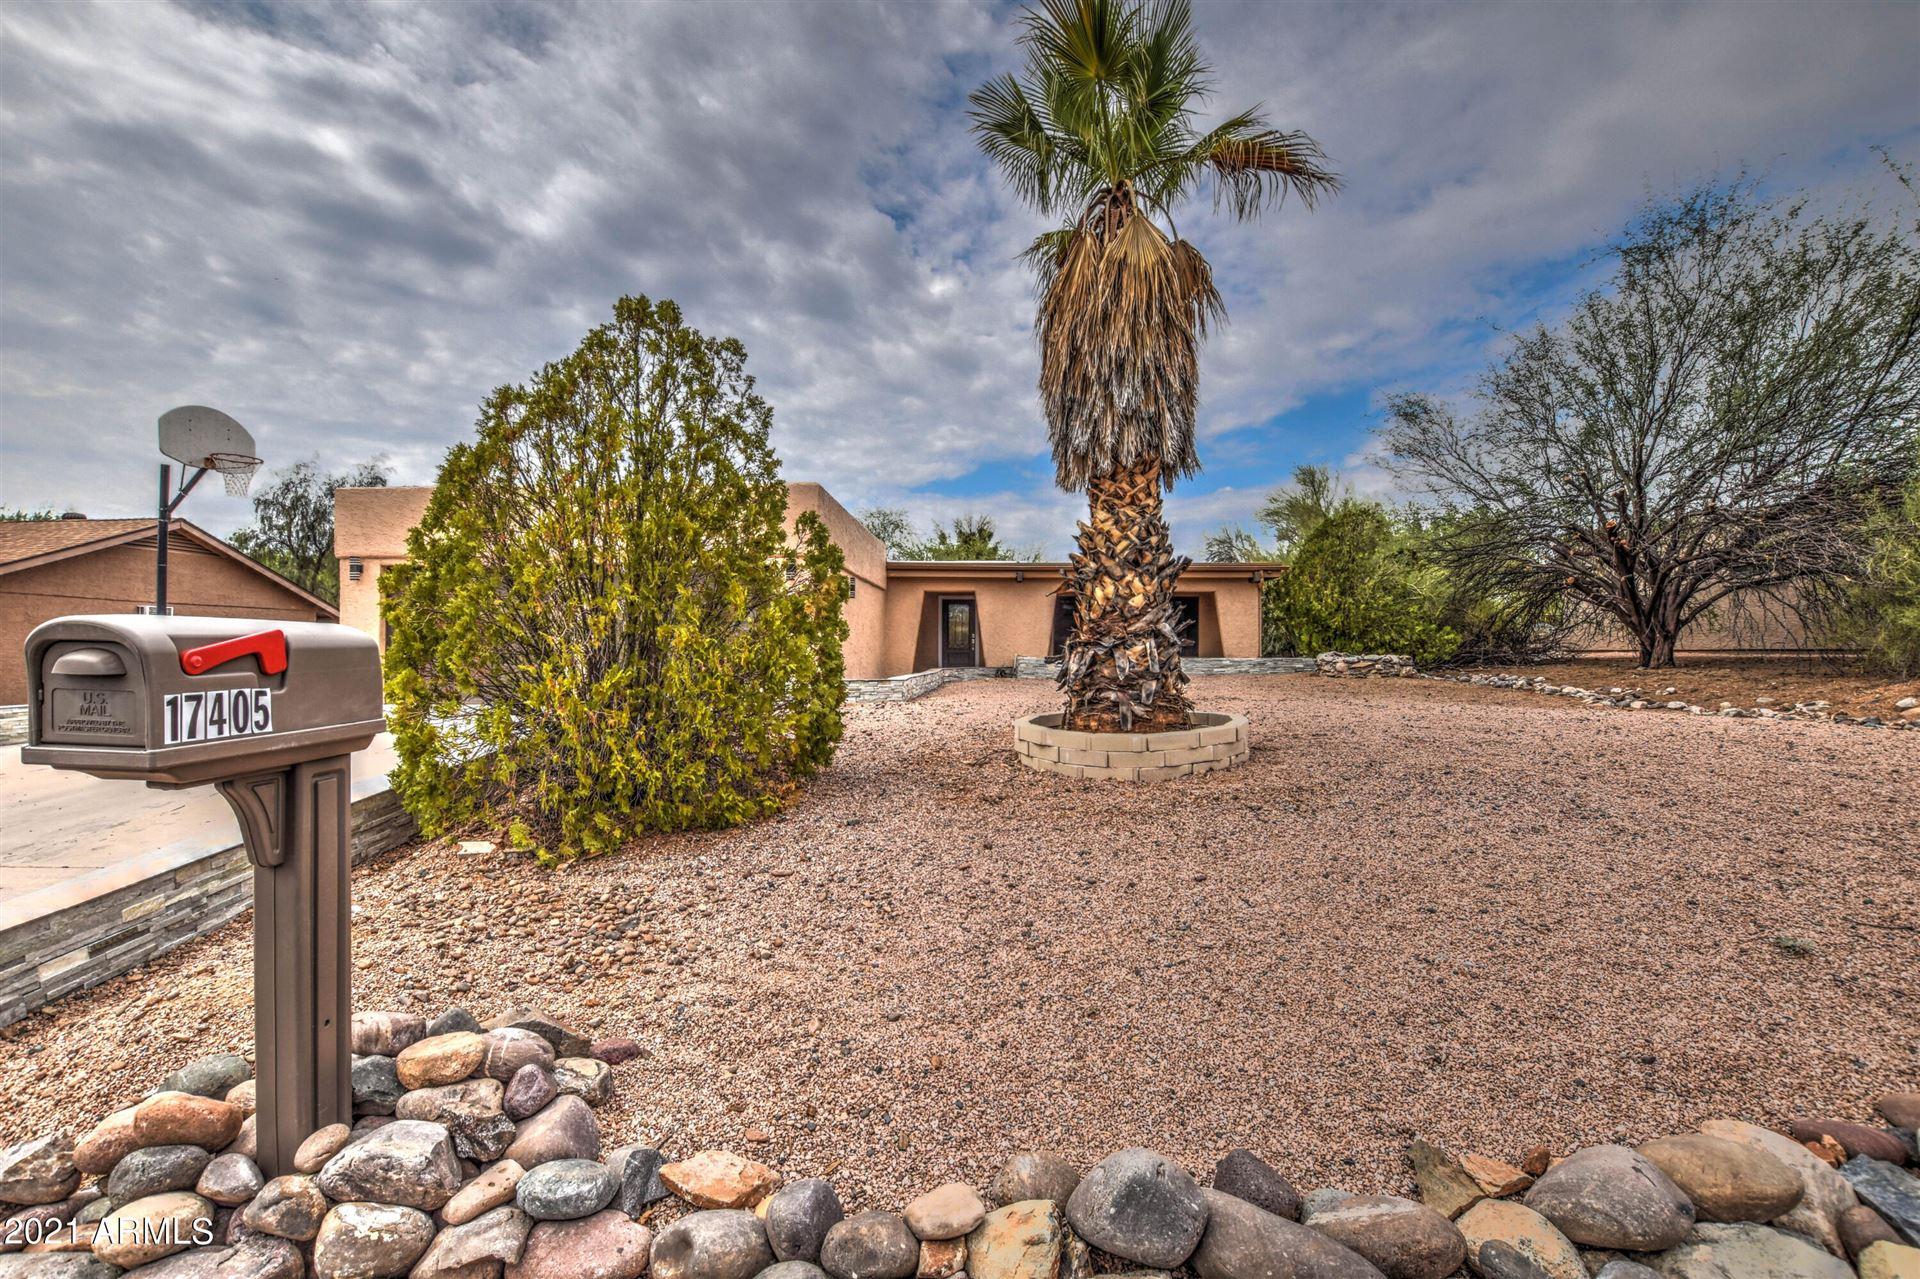 Photo of 17405 E CALAVERAS Avenue, Fountain Hills, AZ 85268 (MLS # 6266486)